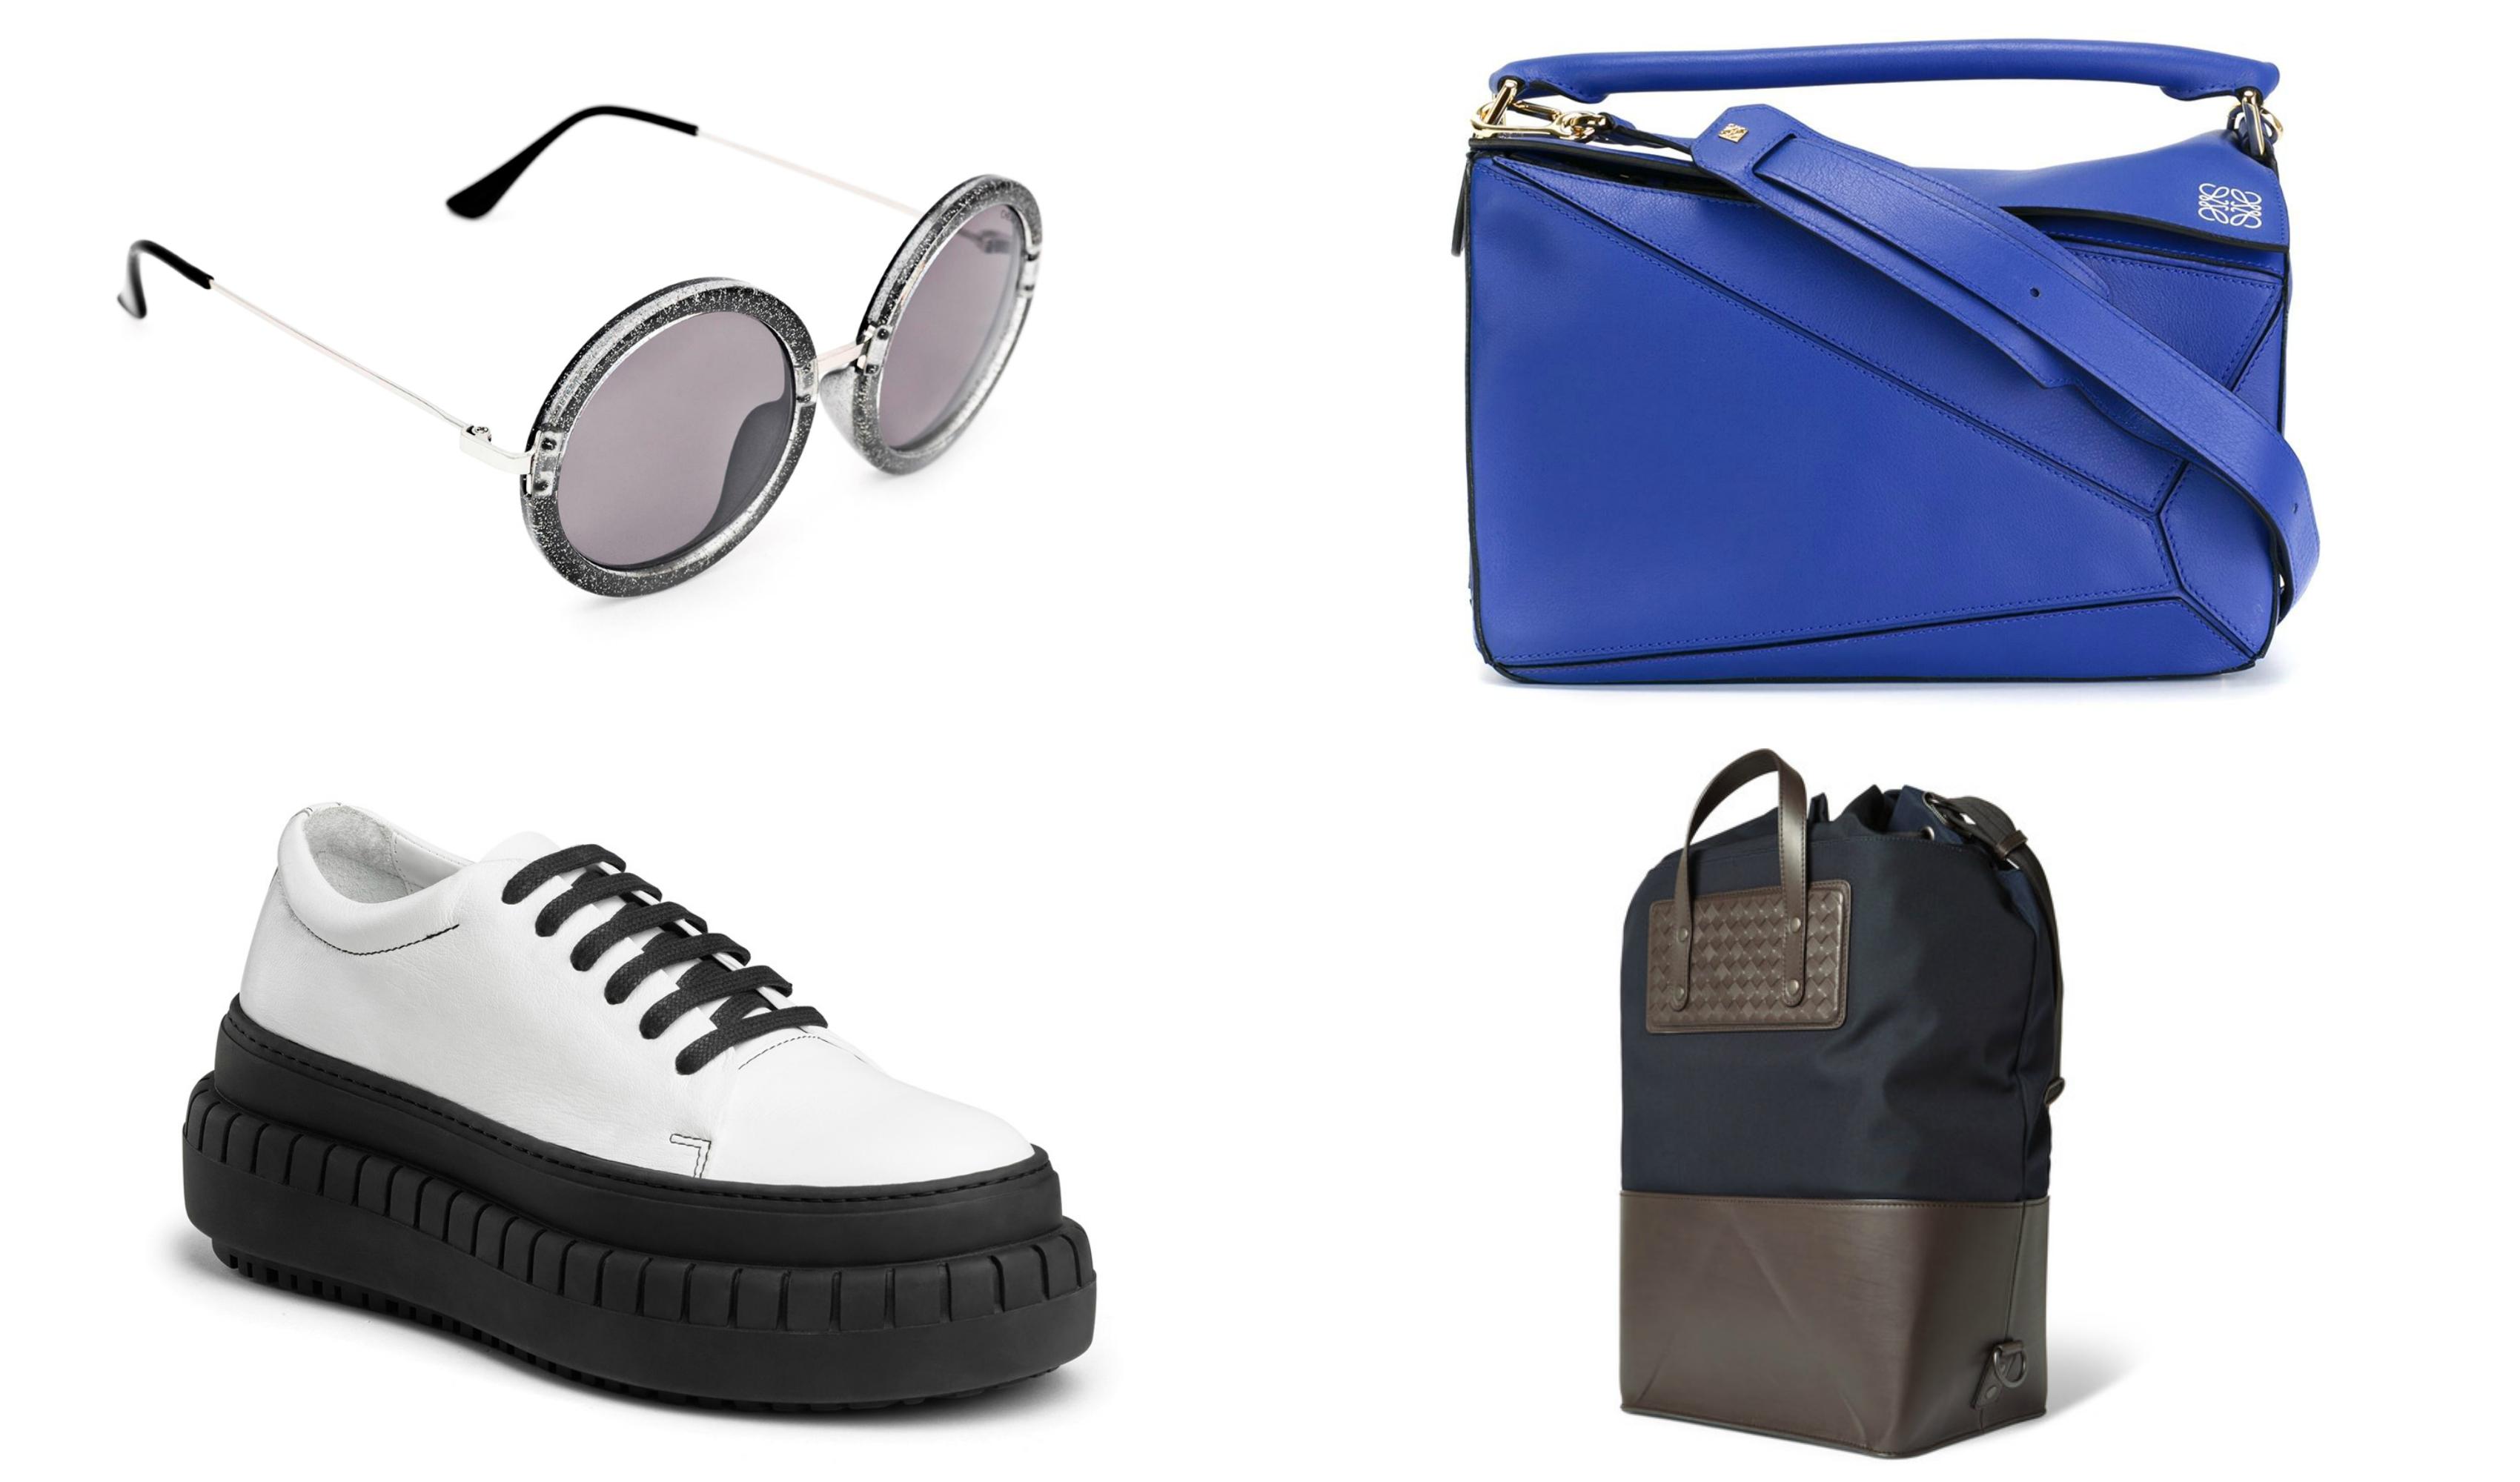 Solbriller fra Cheap Monday. Foto: Weekday/ Plattform sko fra Acne. Foto: Produsenten/ Veske fra Loewe. Foto: Farfetch/ Veske fra Bottega Venata. Foto: MrPorter